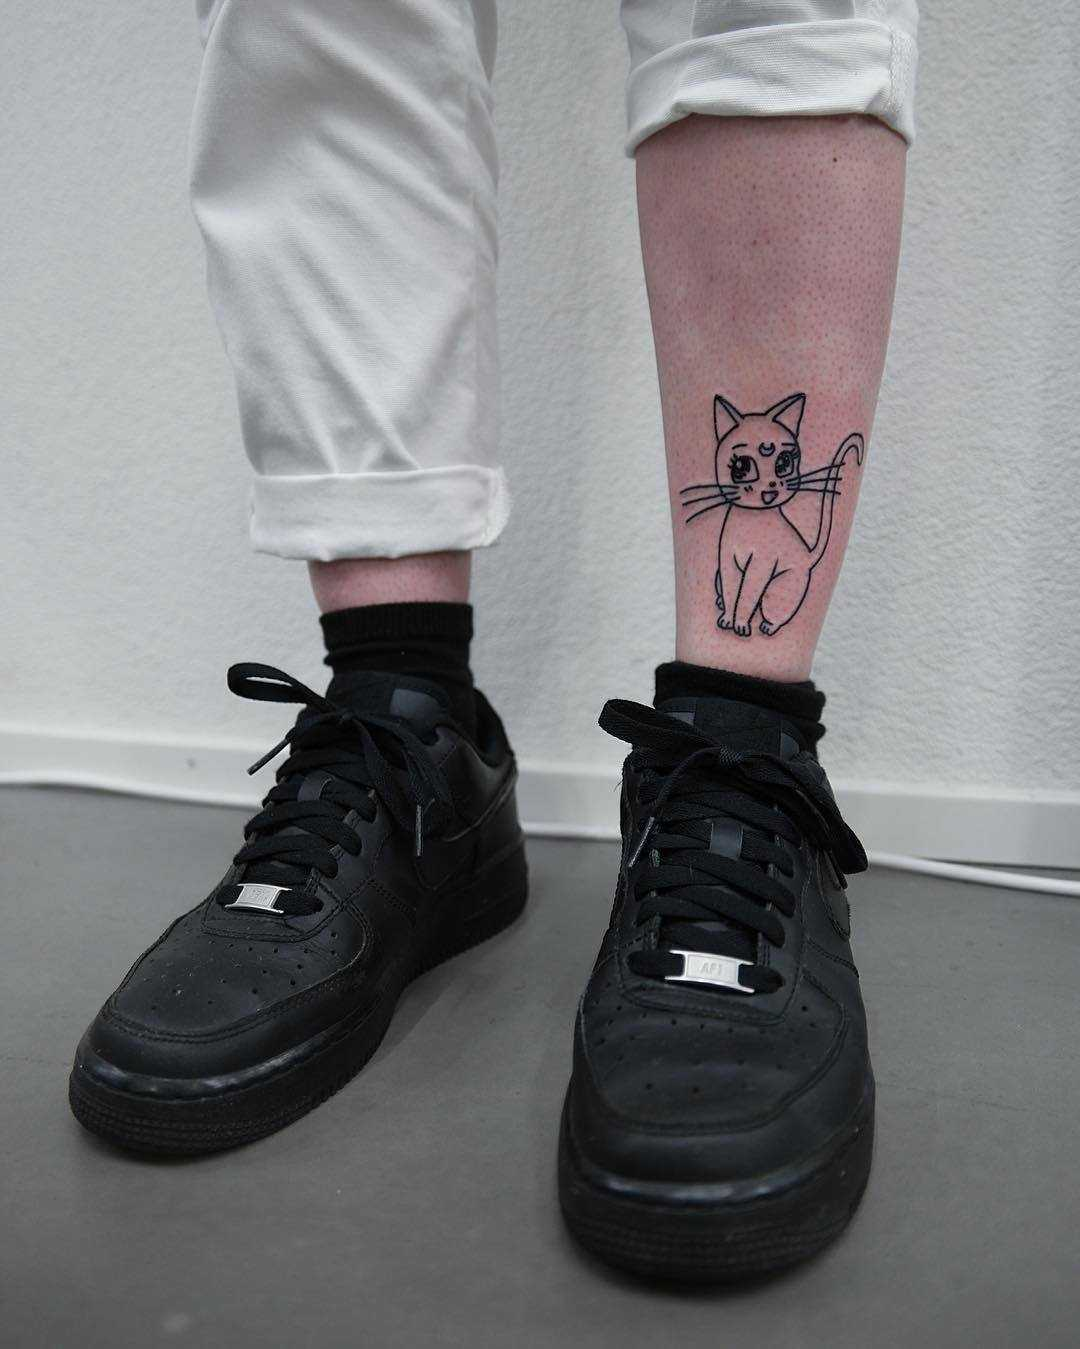 Cute cat tattoo on the shin